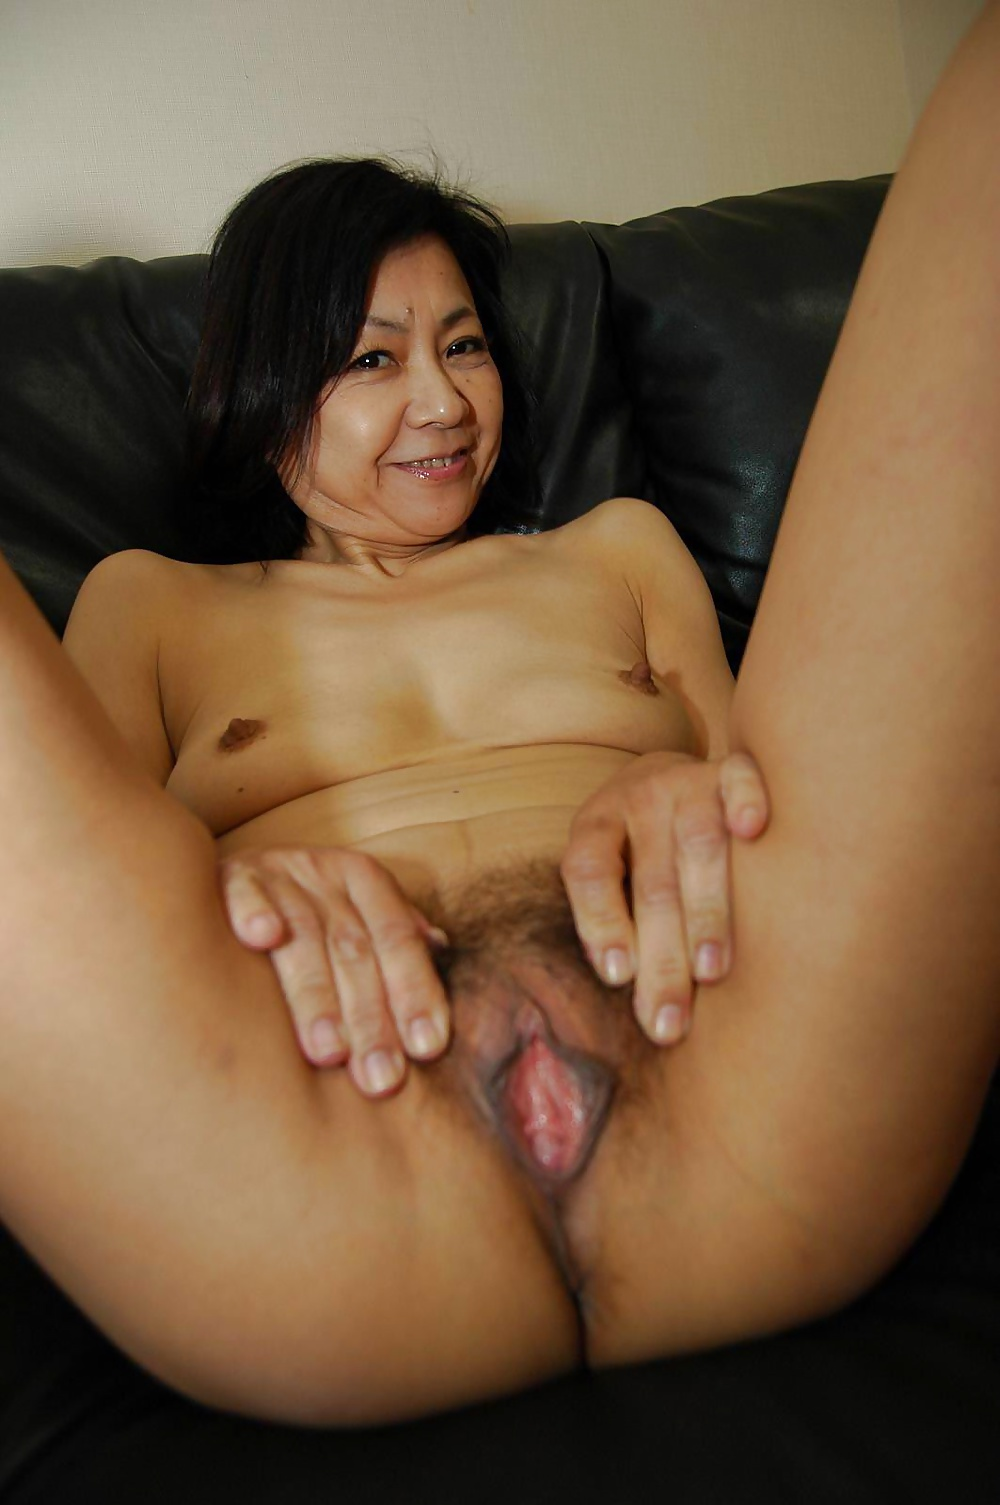 smotret-babushka-yaponskie-erotika